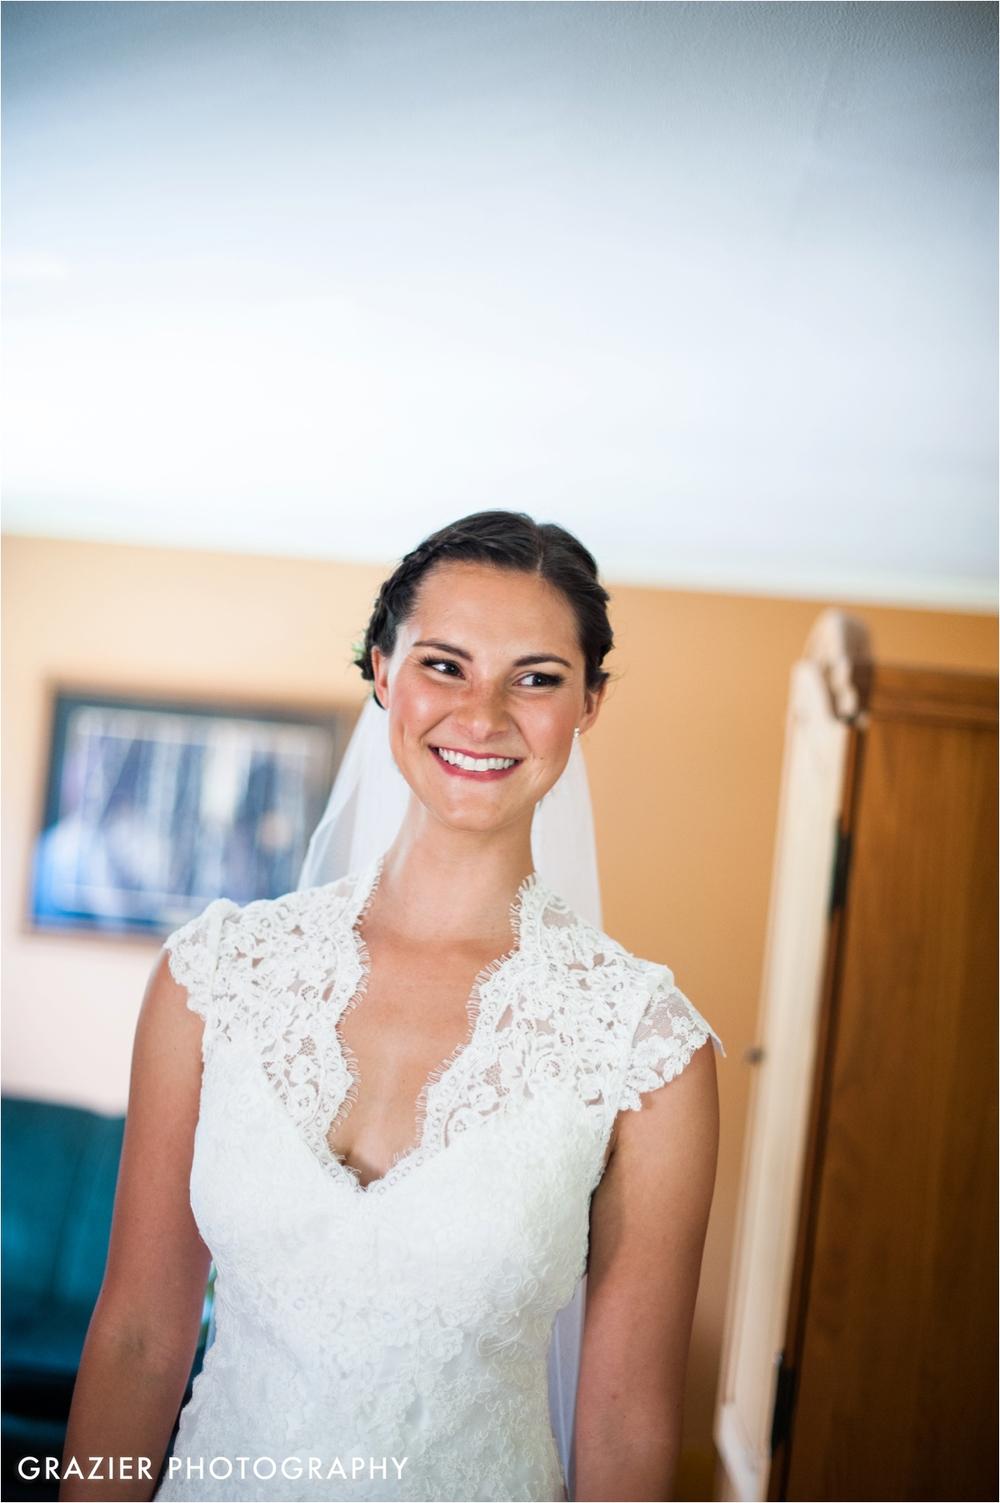 Whitneys-Inn-Jackson-New-Hampshire-Wedding-Grazier-Photography-WEB_0006.jpg